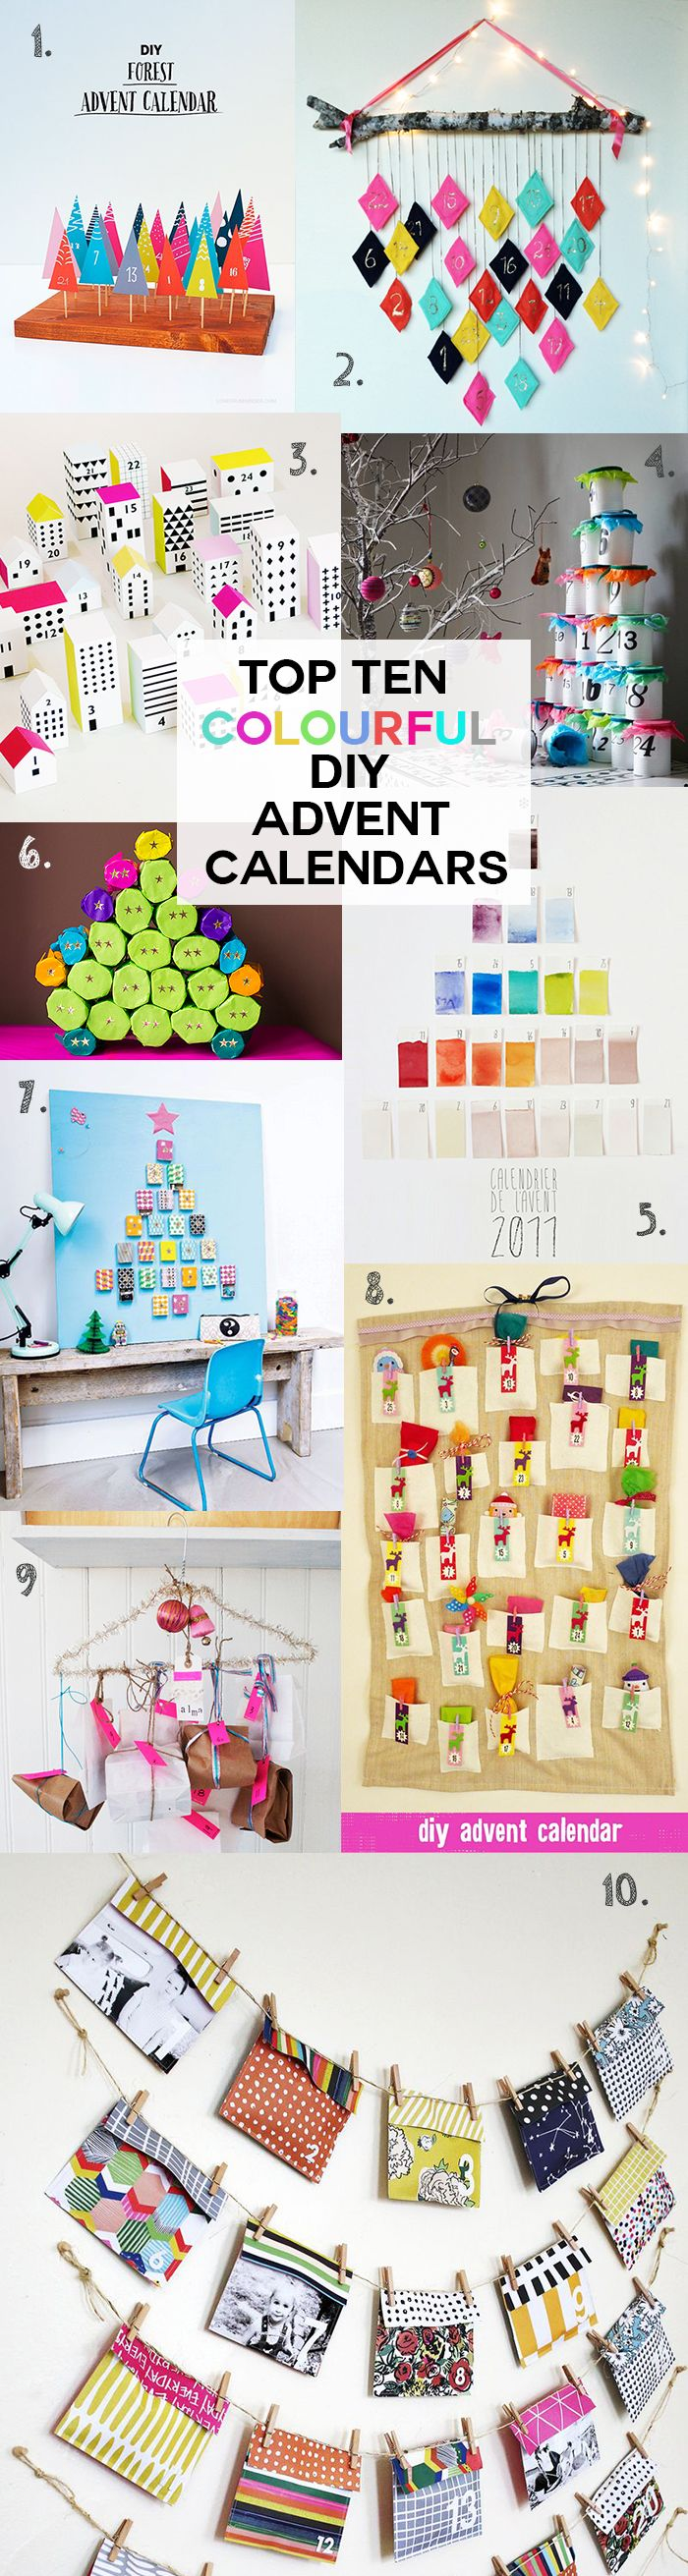 25 best kinder schokolade adventskalender ideas on for Adventskalender pinterest